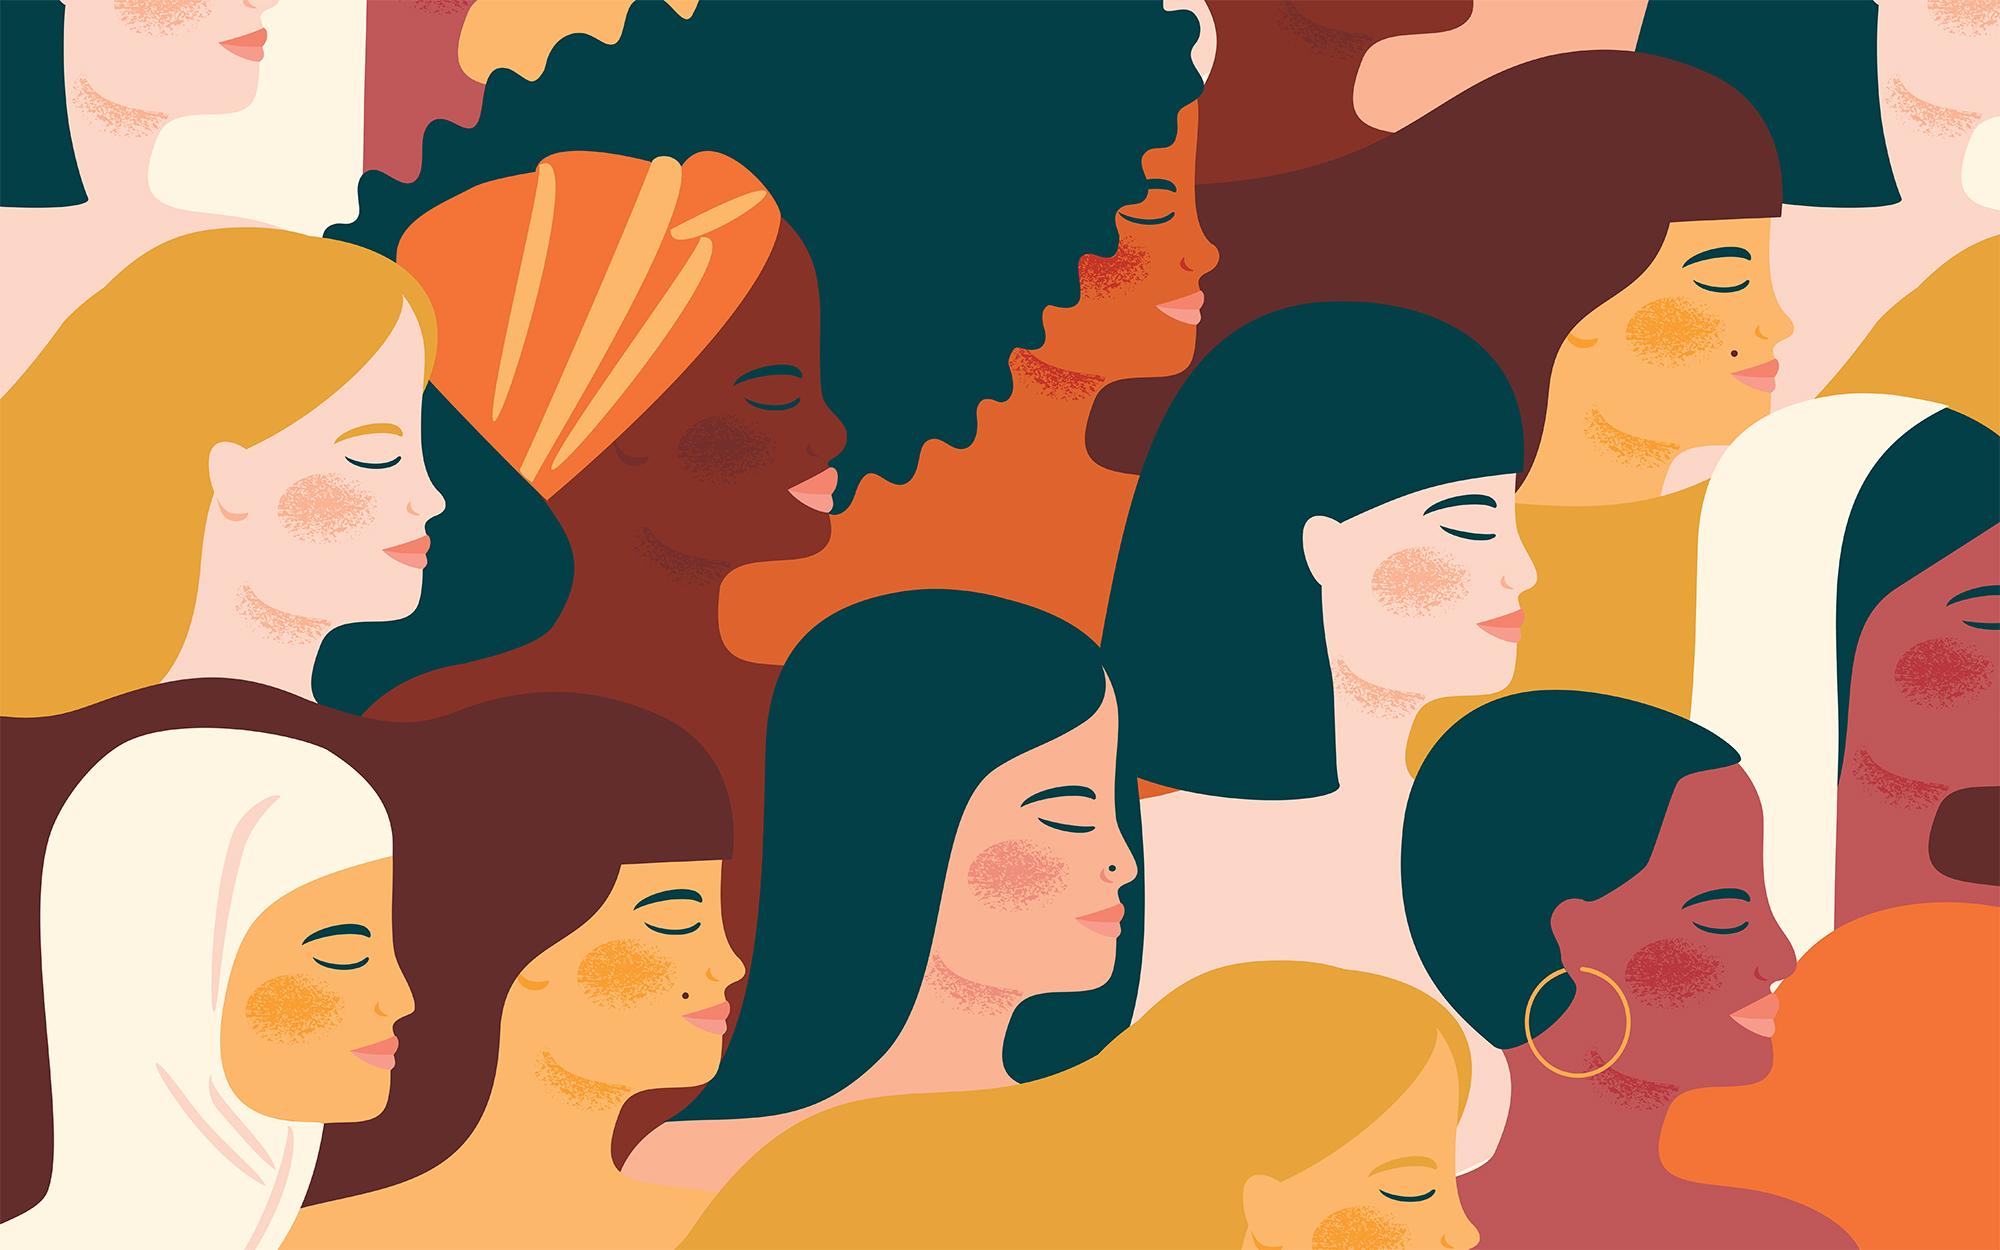 Powerful Women of the Mindfulness Movement 2020